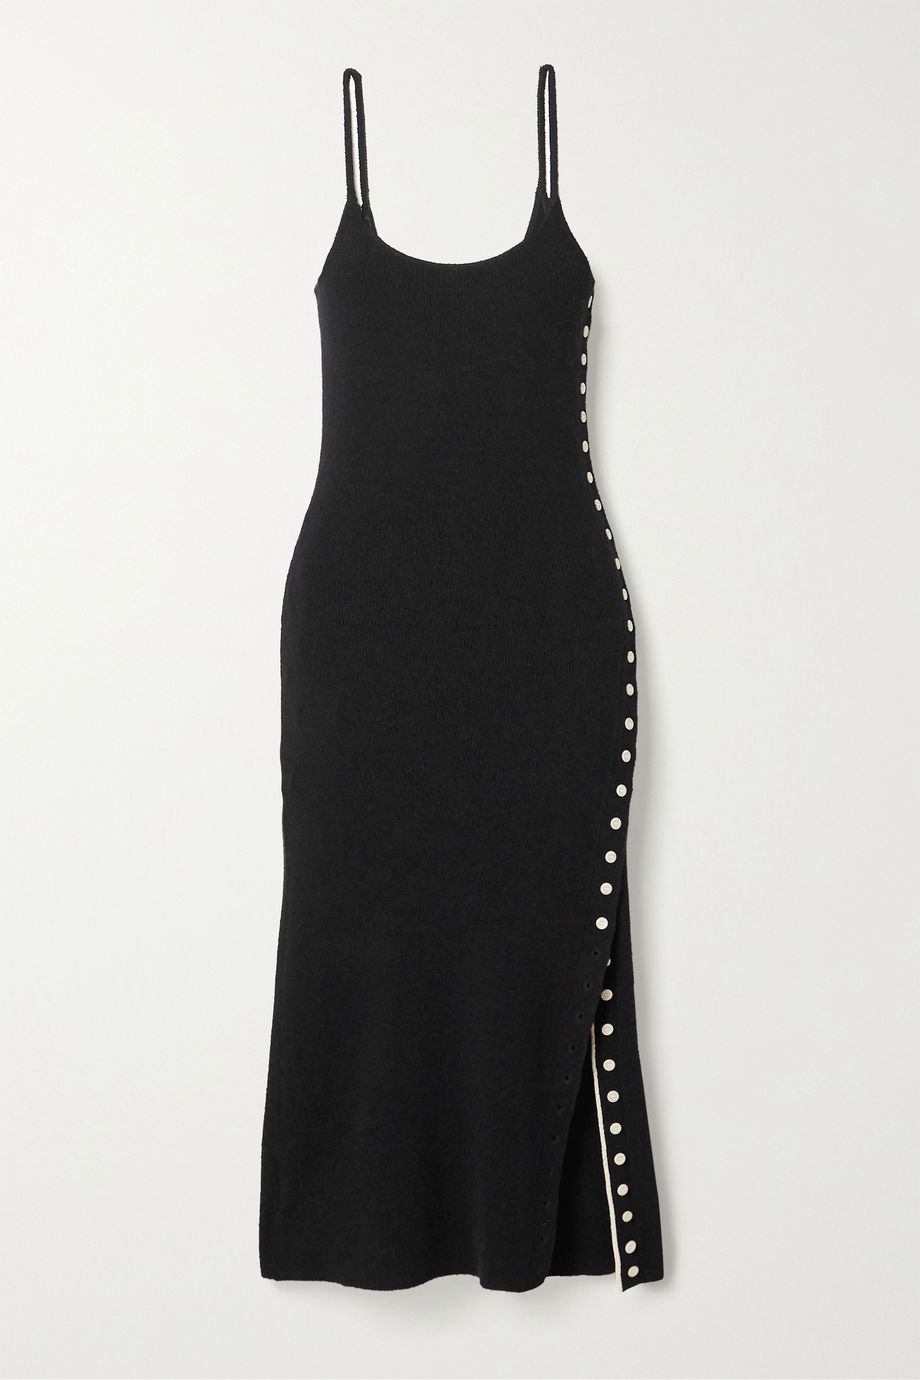 Proenza Schouler White Label Button-detailed ribbed-knit midi dress